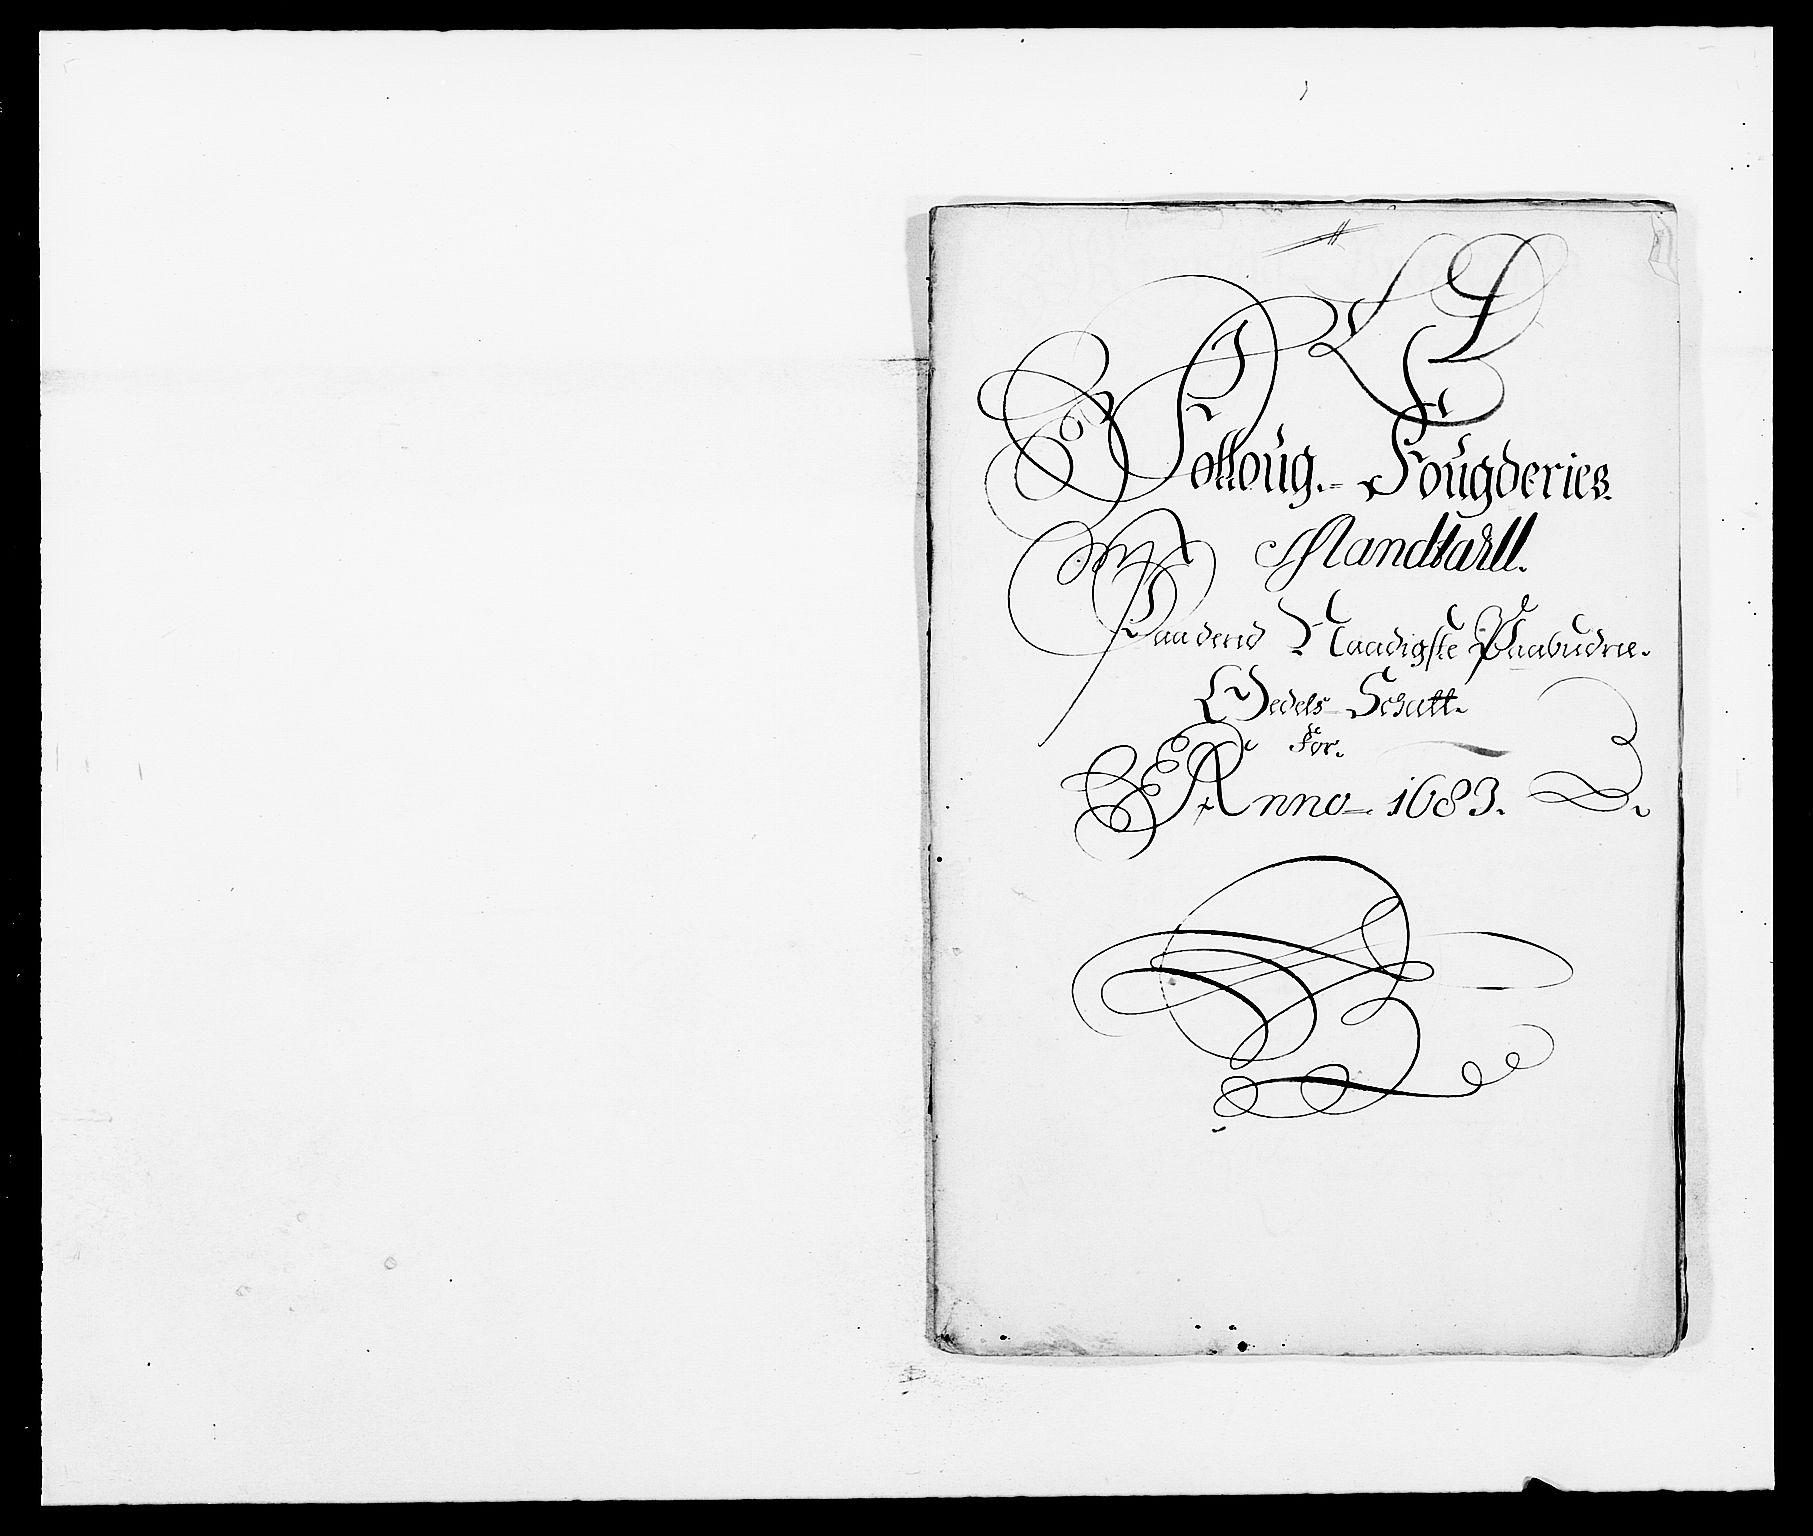 RA, Rentekammeret inntil 1814, Reviderte regnskaper, Fogderegnskap, R09/L0430: Fogderegnskap Follo, 1682-1683, s. 393